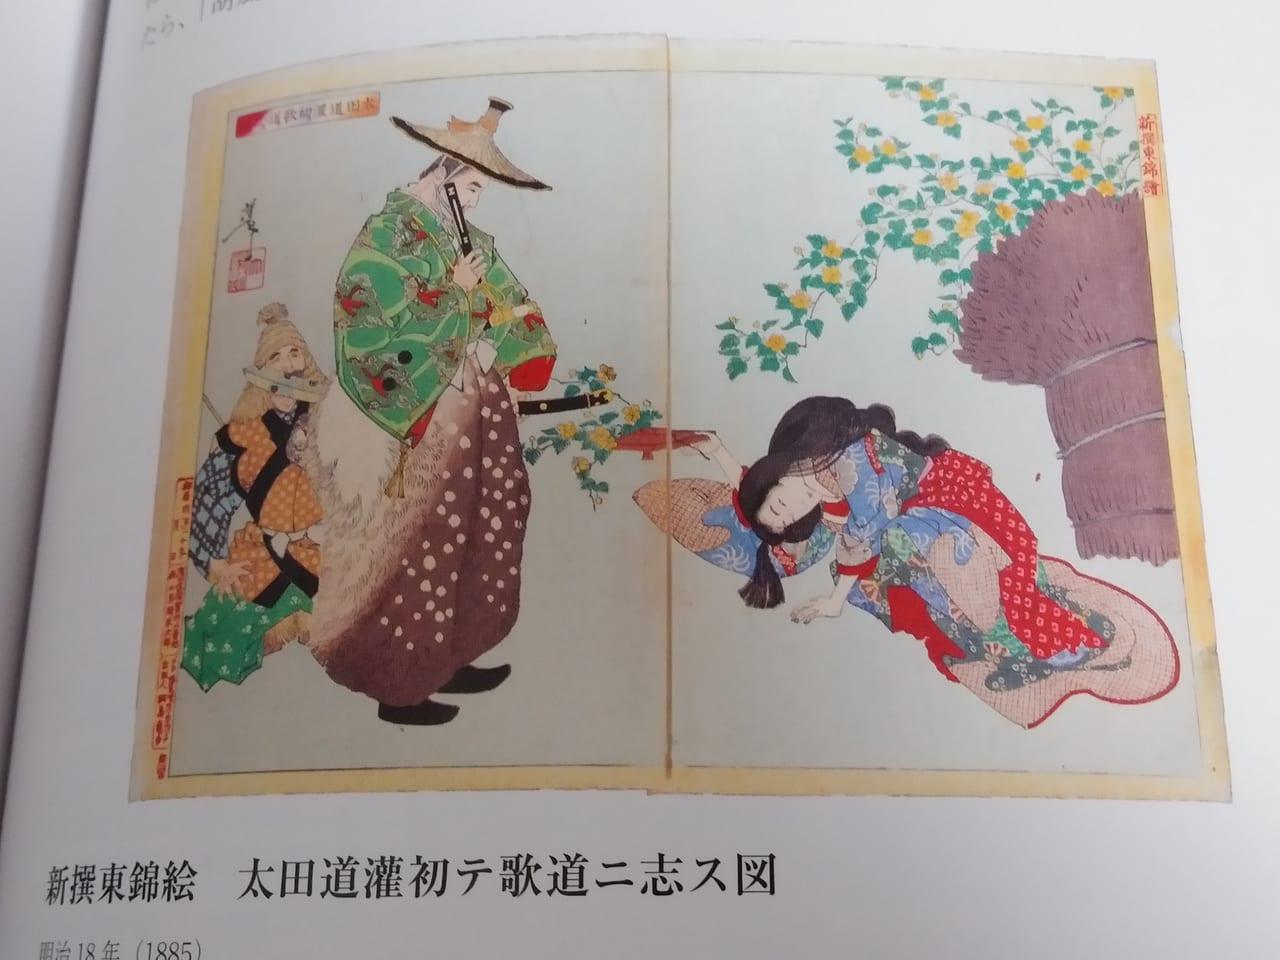 山吹伝説の錦絵